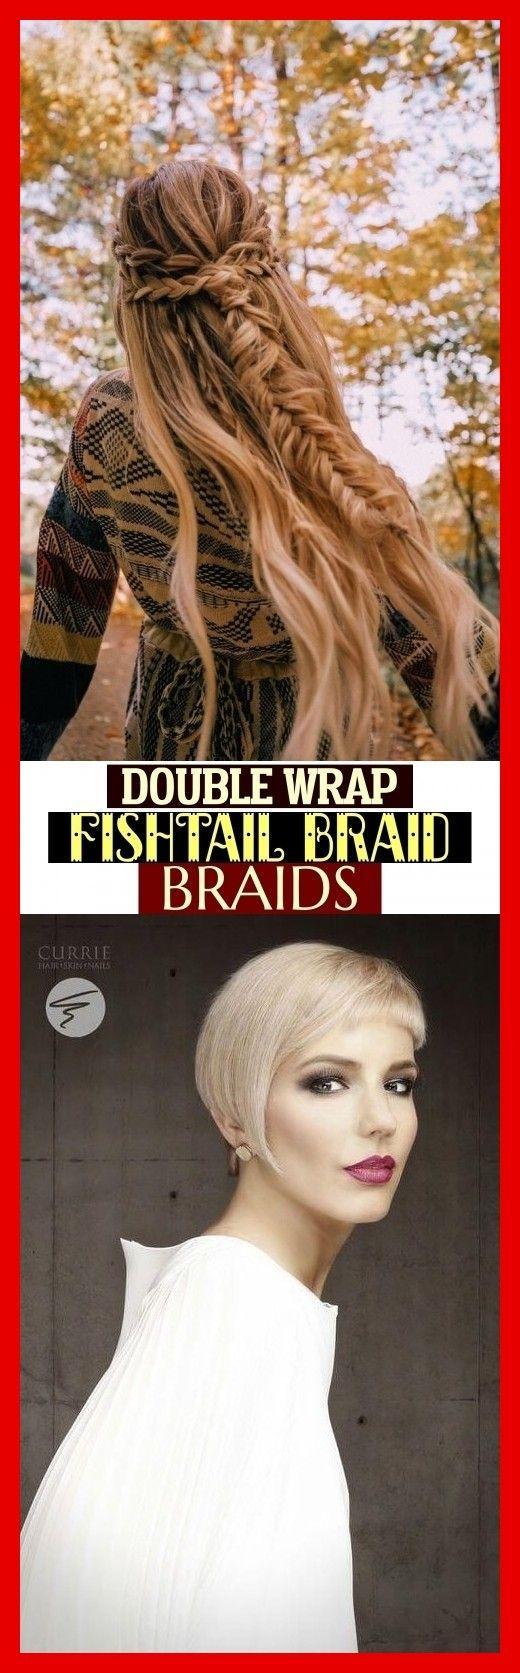 DIY Friendship Bracelets: Fishtail Braid #easyfriendshipbraceletpatterns One of the easiest friendship bracelet tutorials you'll find... you'll want to make these DIY friendship bracelets all summer long!